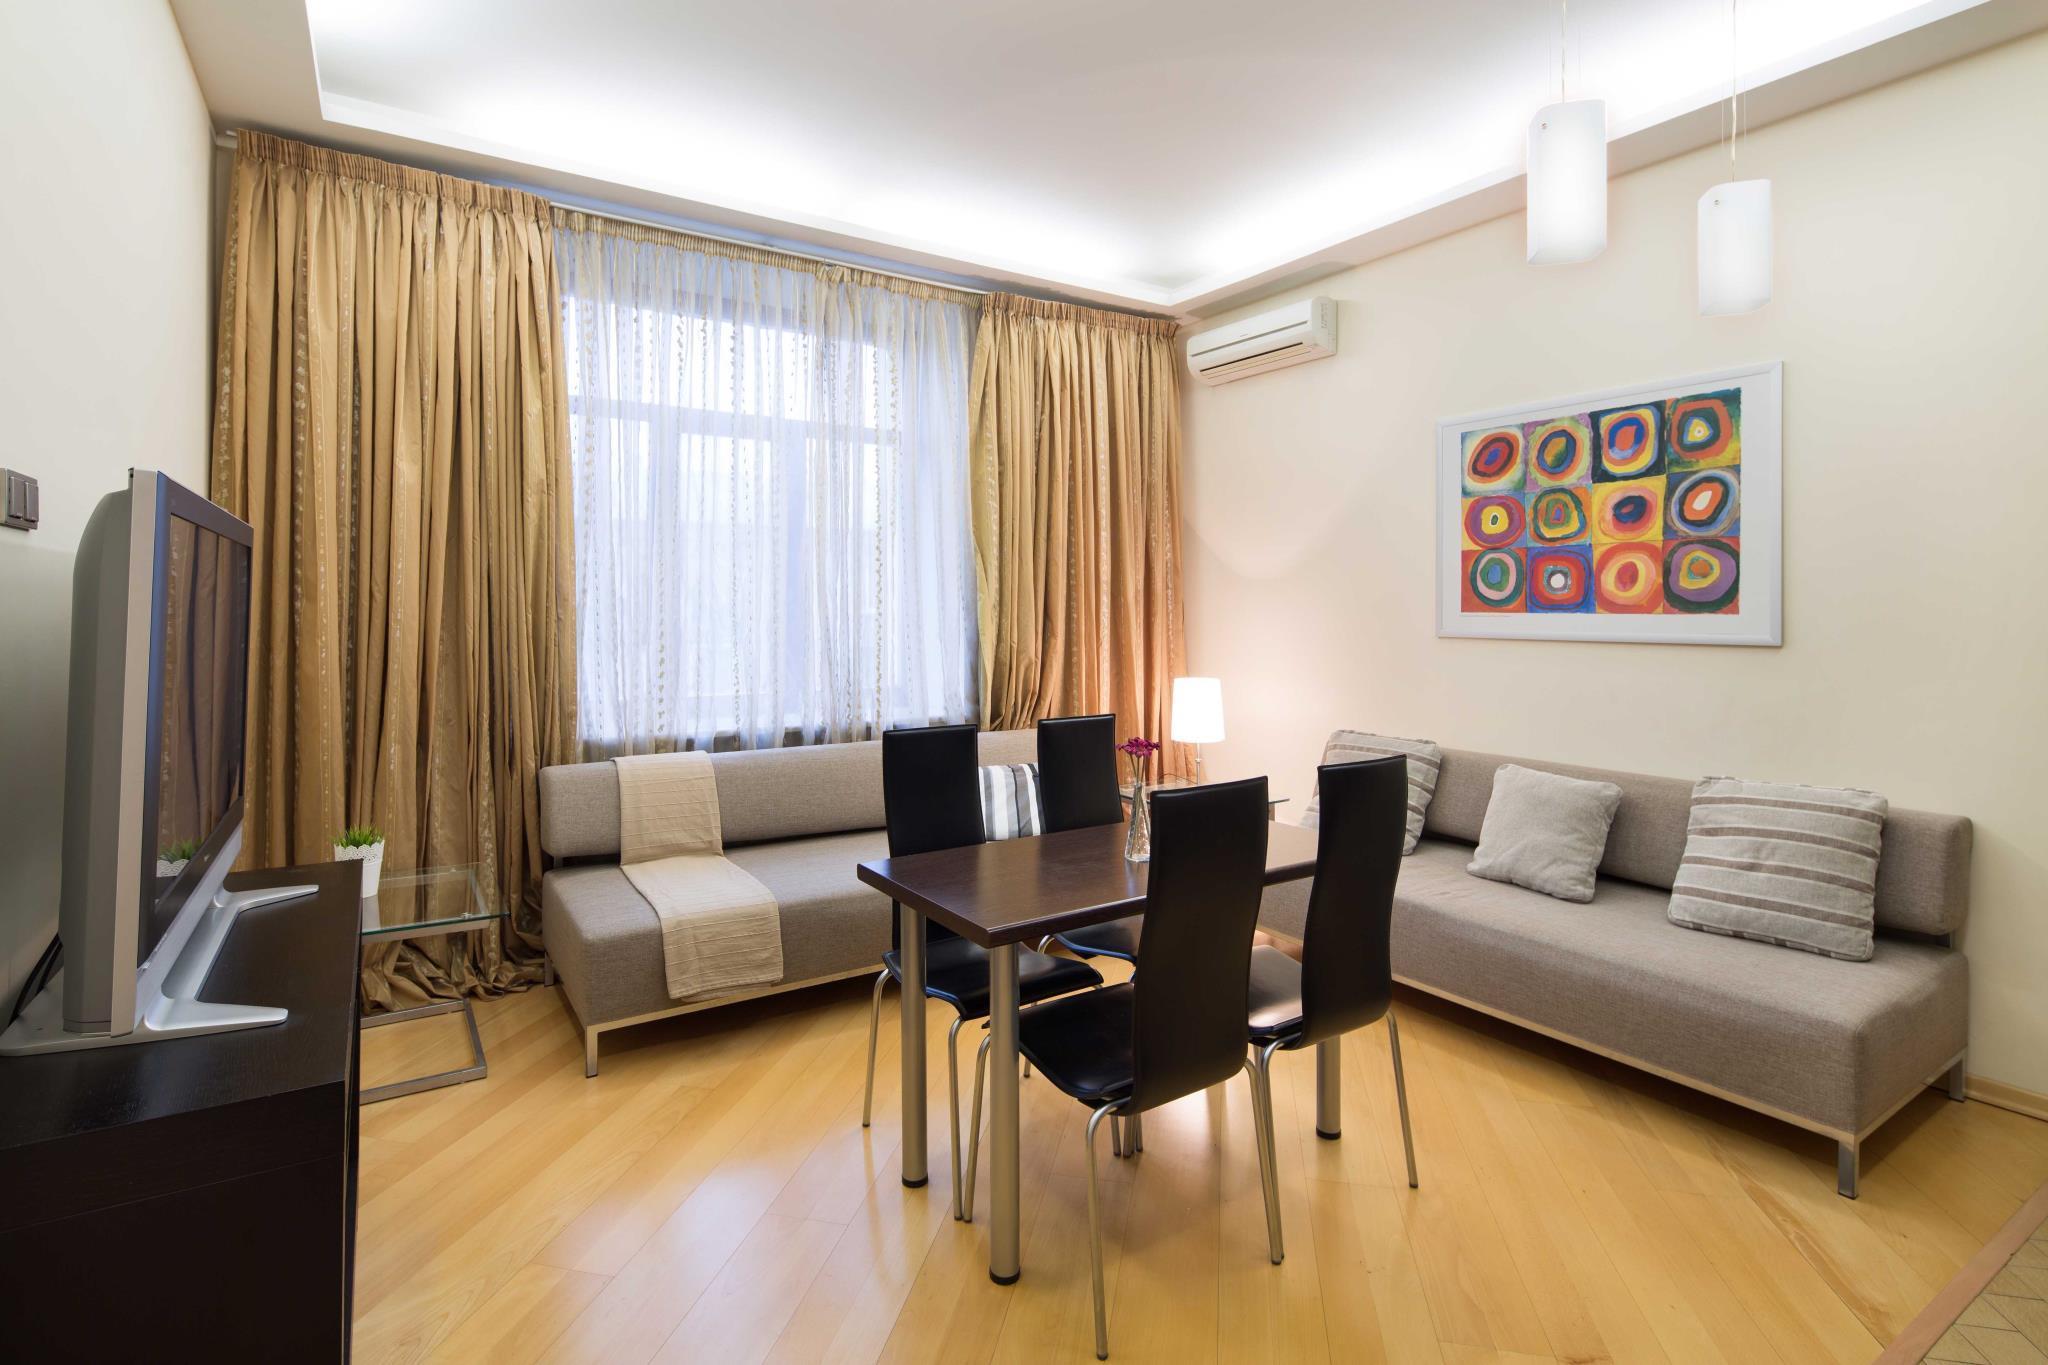 Two Bedroom Apartment In Dorogomilovo